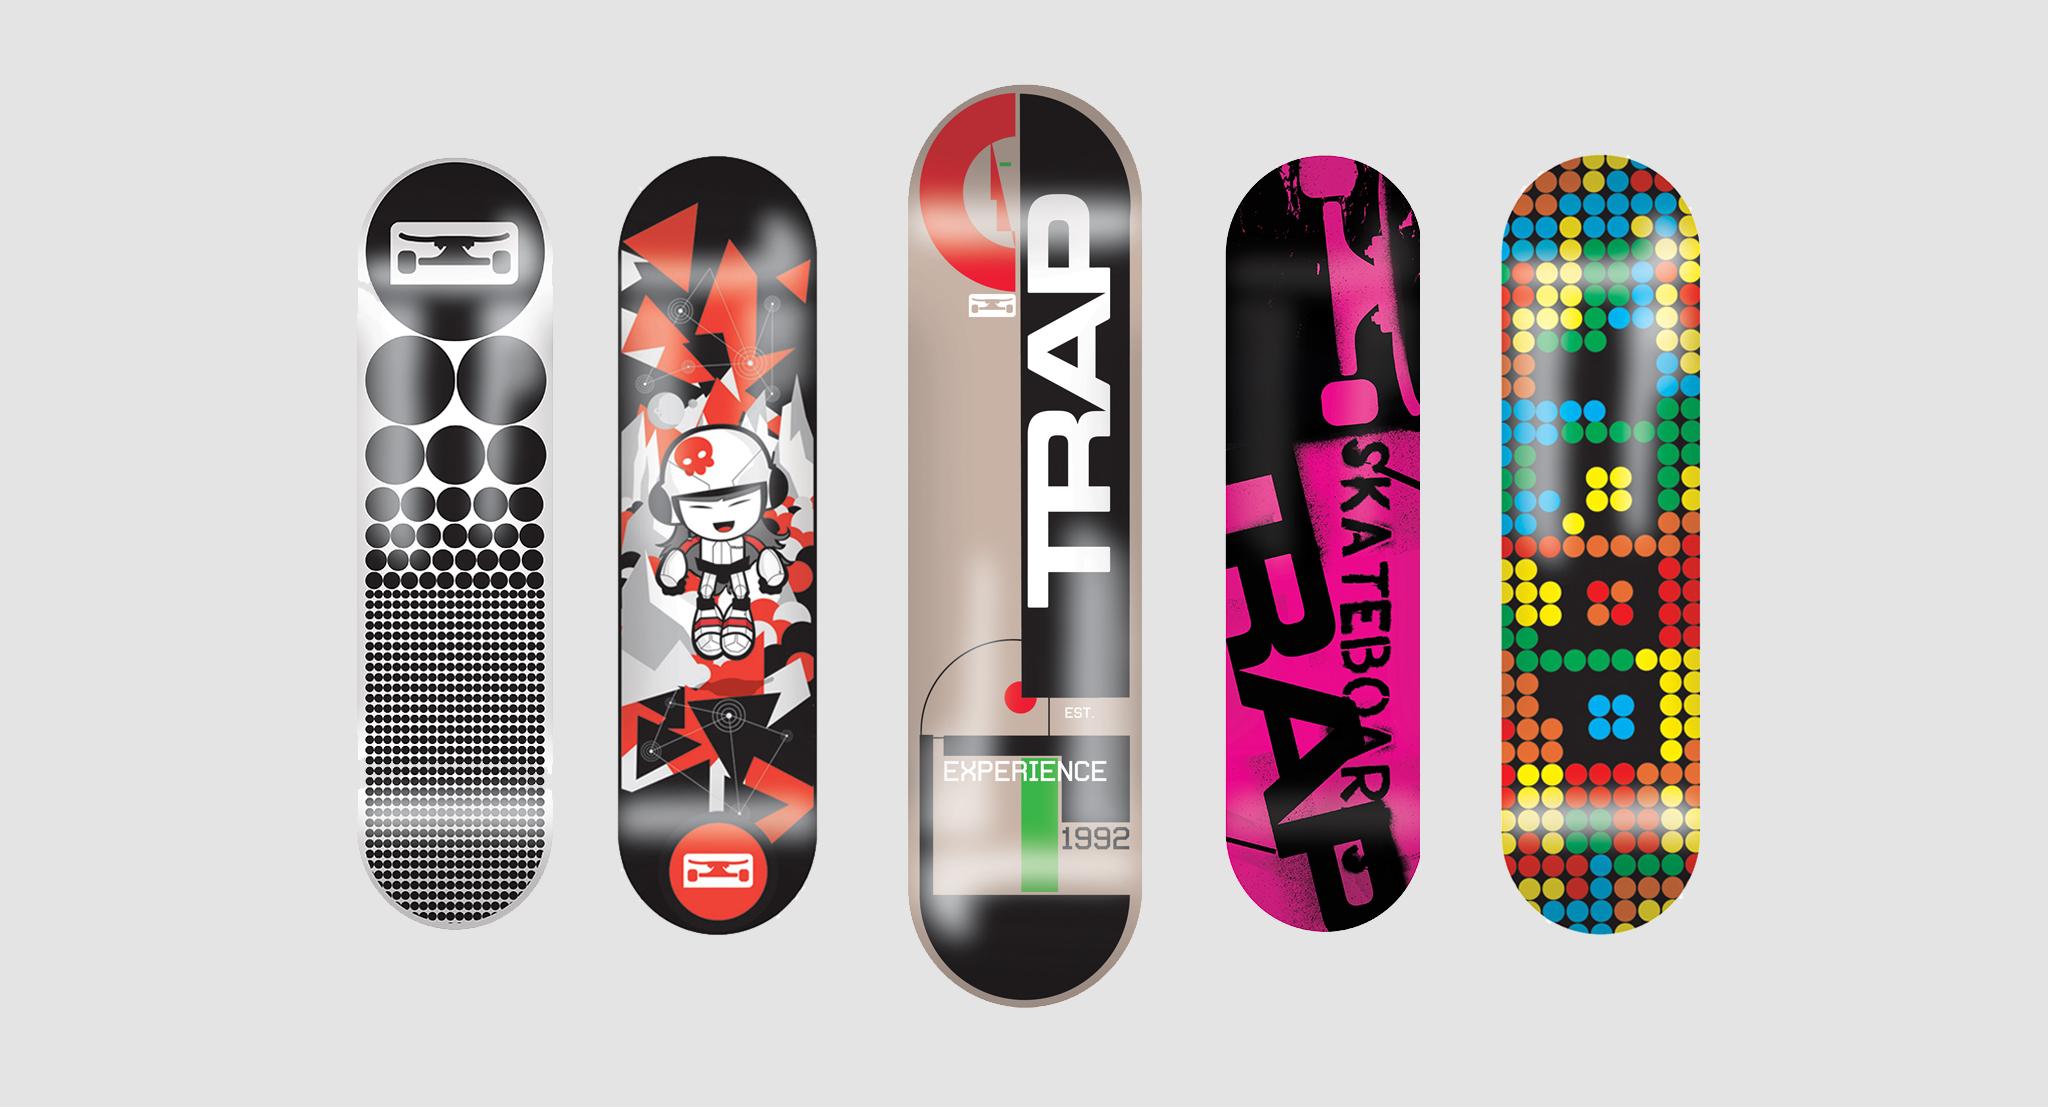 Skateboard_page_18